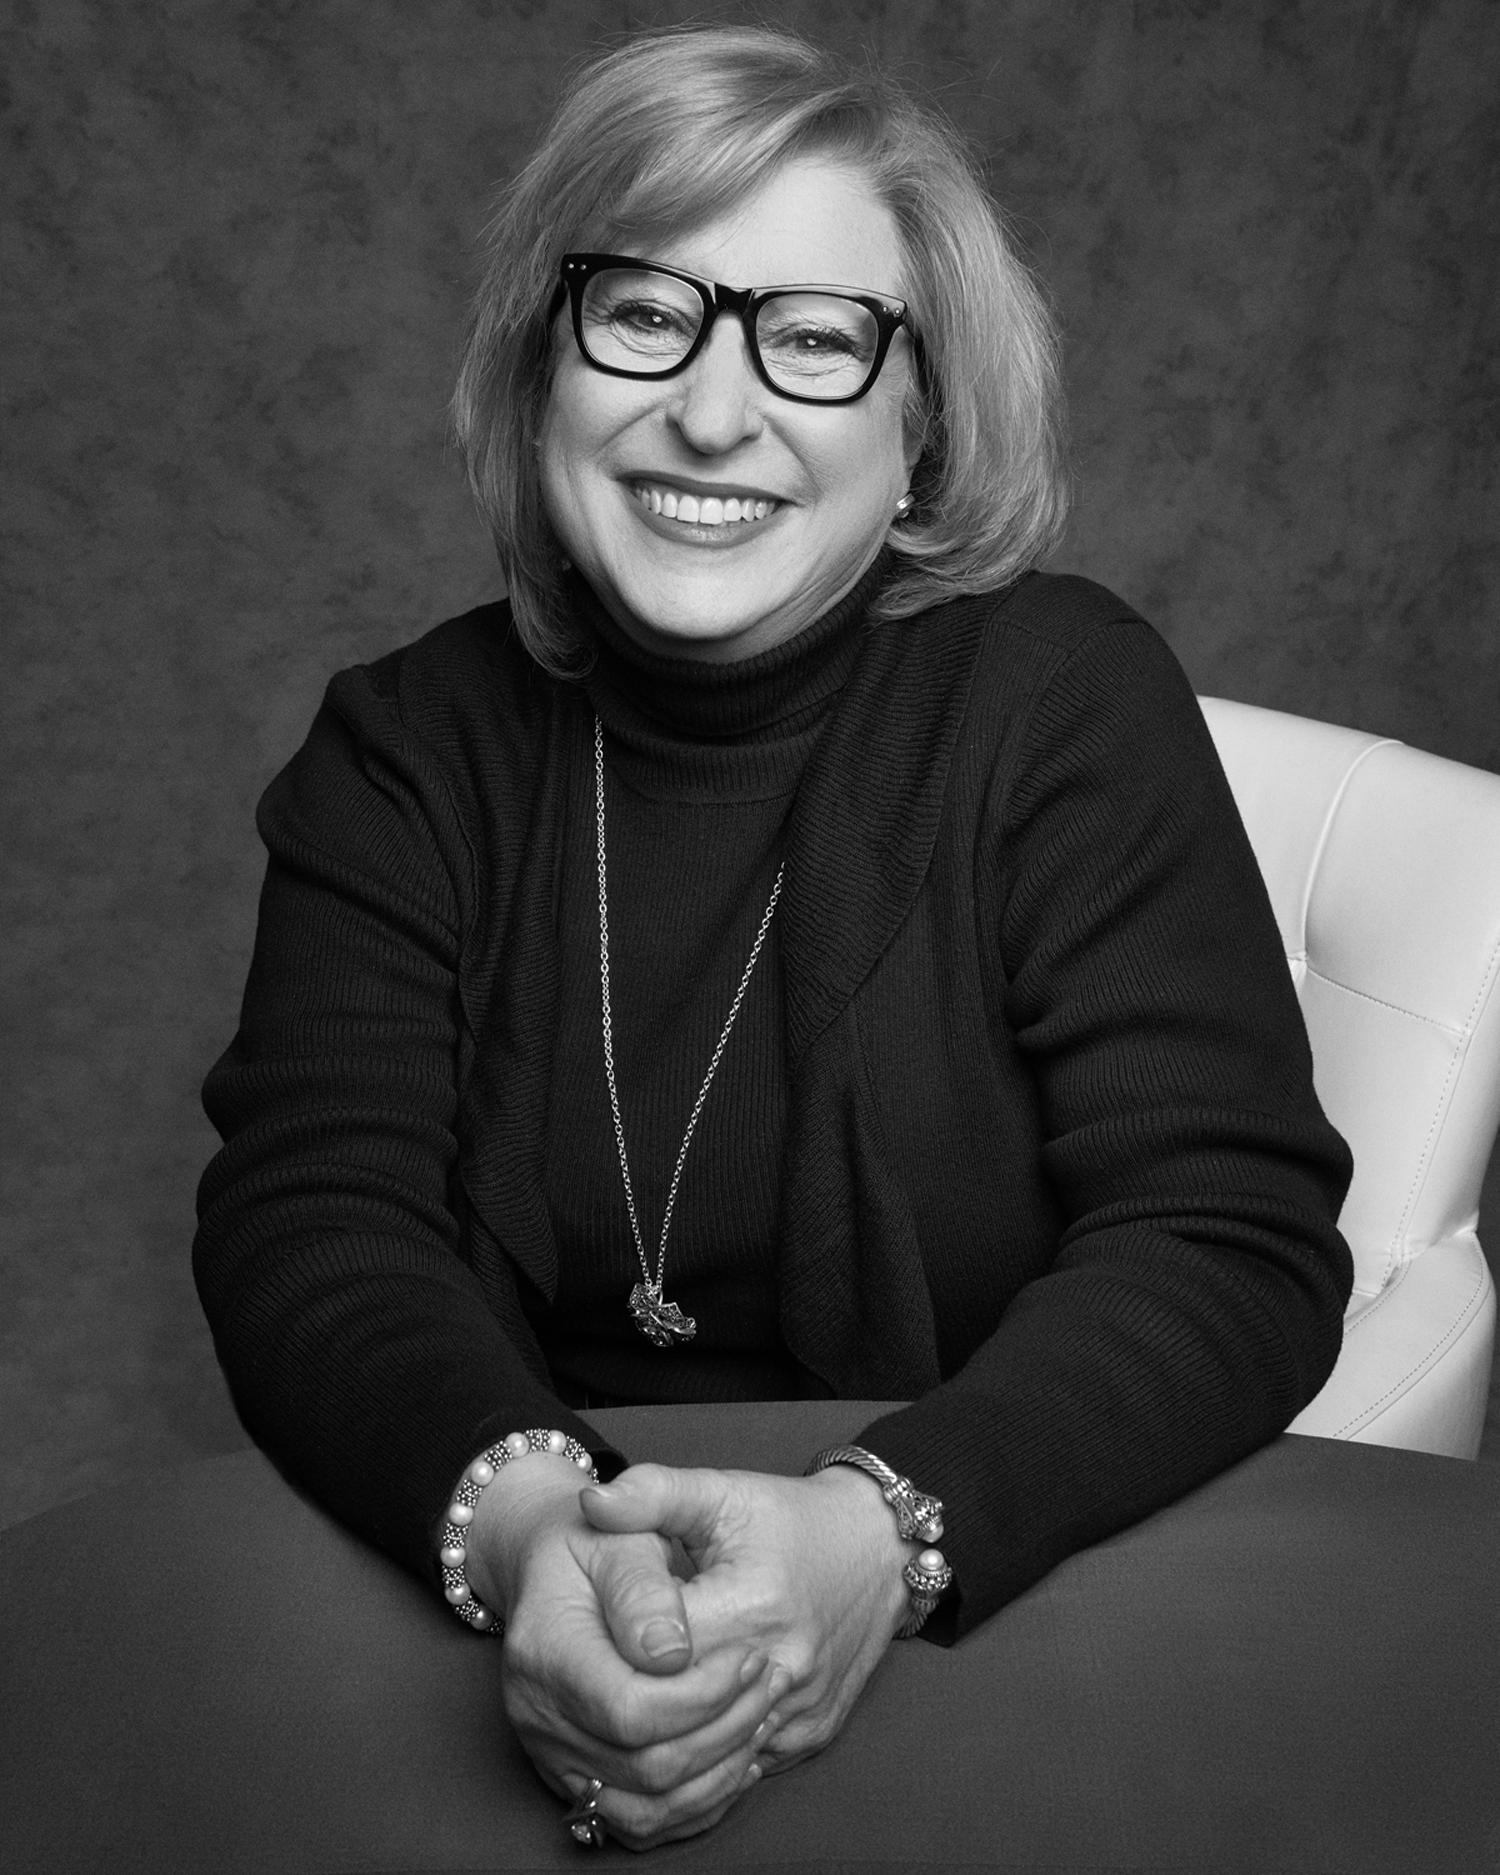 Lois Gamerman, President & CEO, Soft Stuff Distributors, Inc.